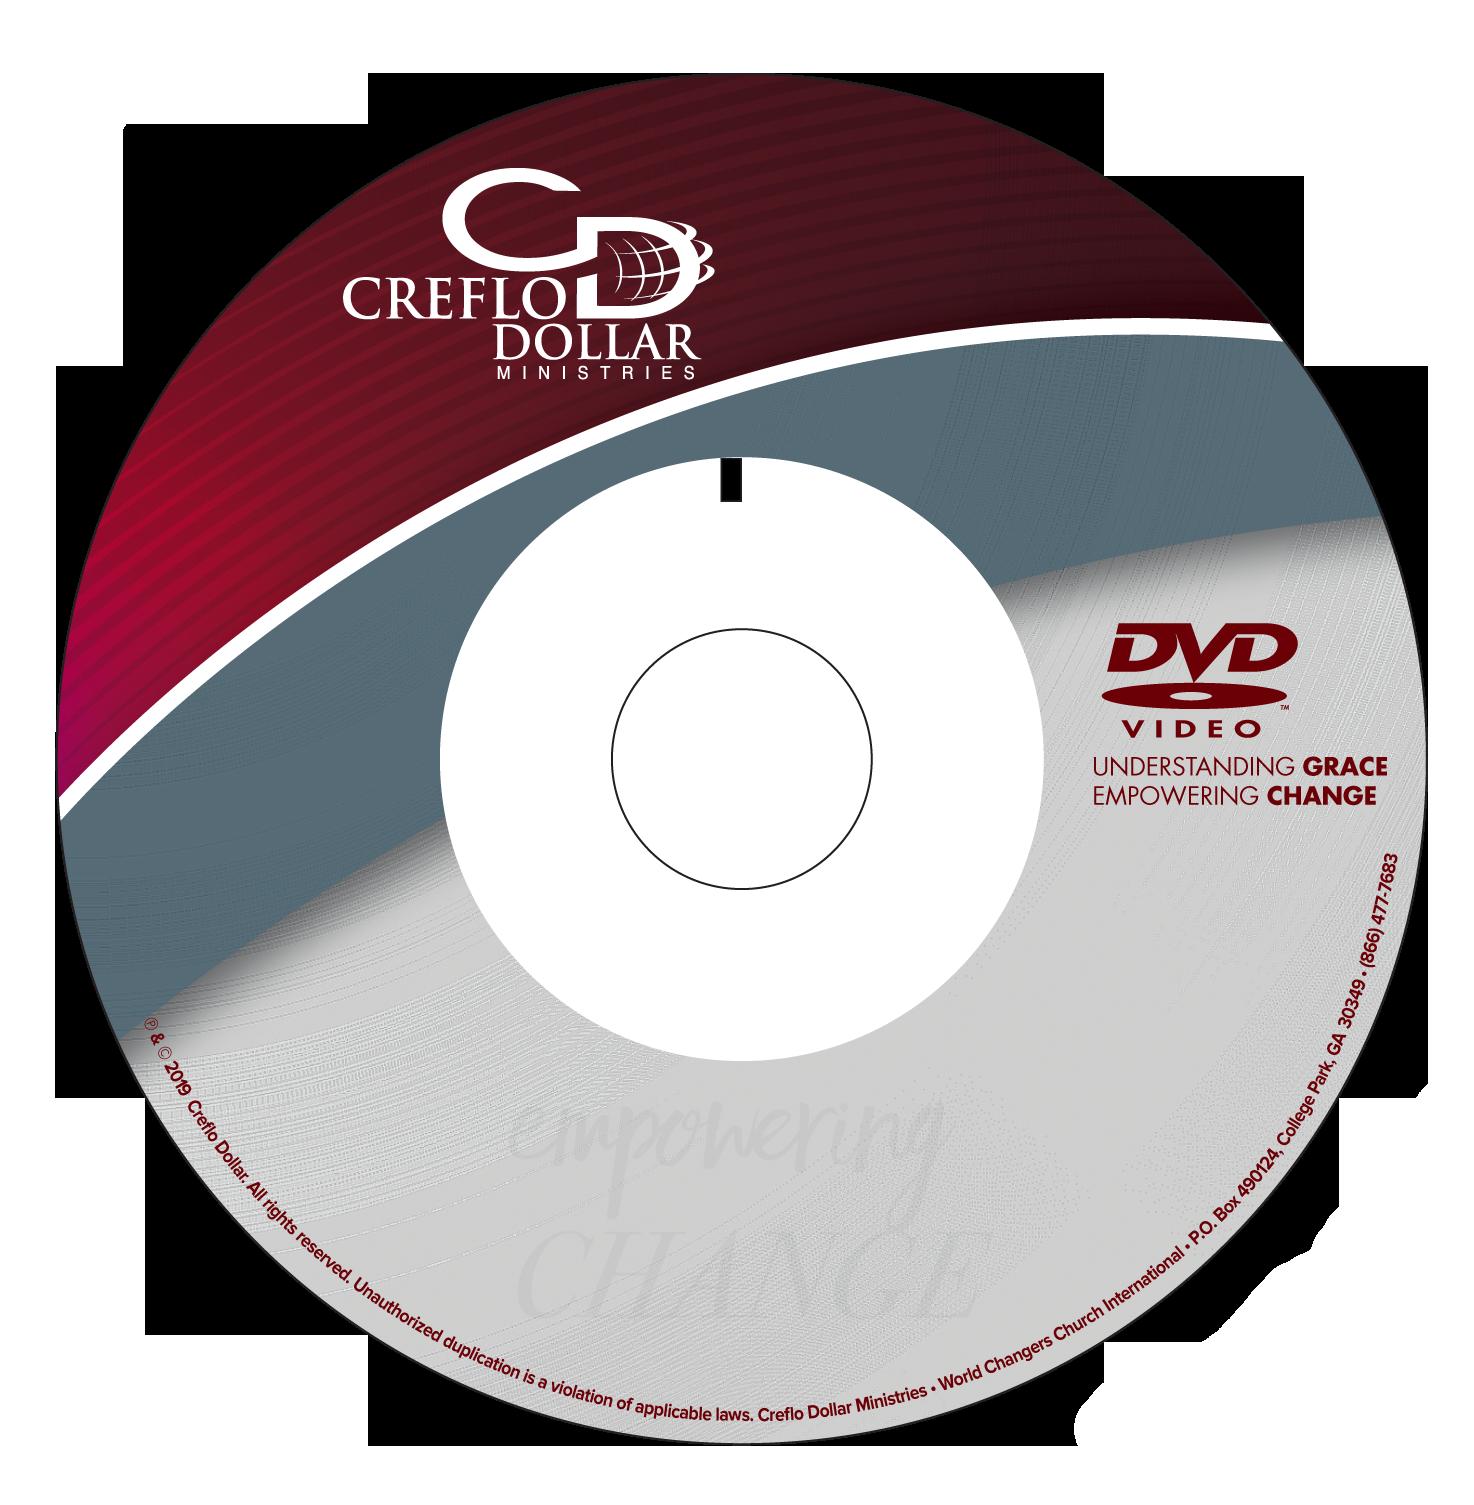 031019 Sunday Service DVD 10am